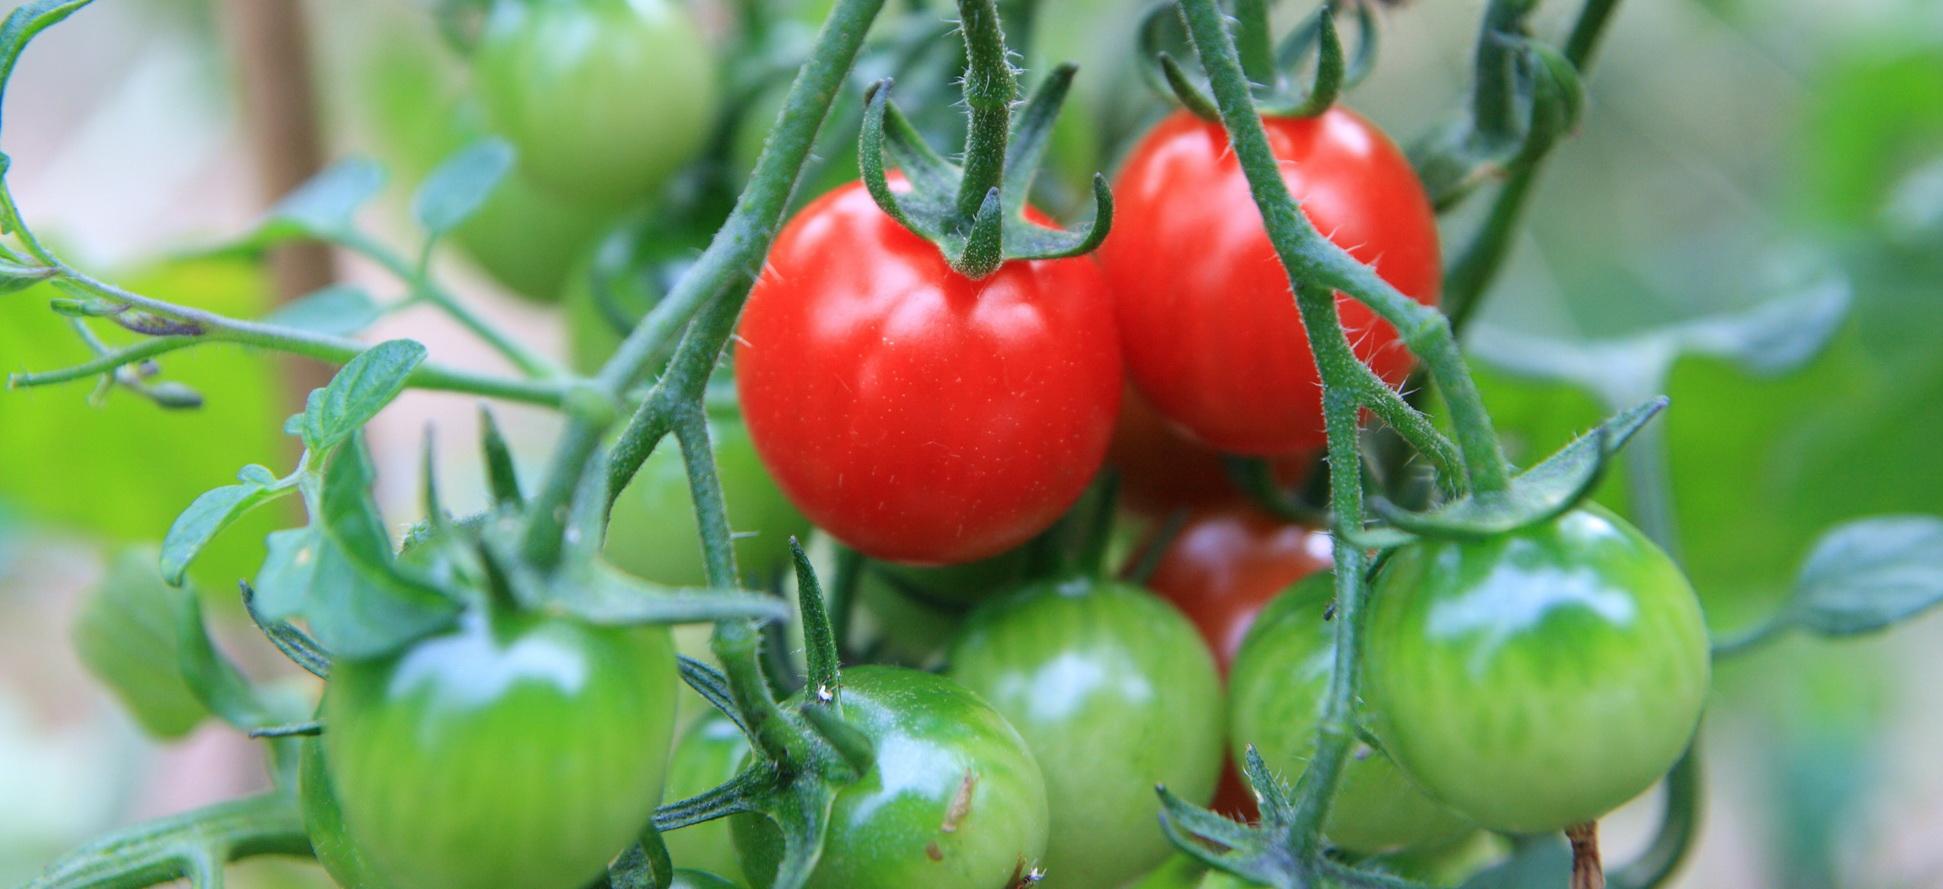 Cherry tomatoes 1900x800